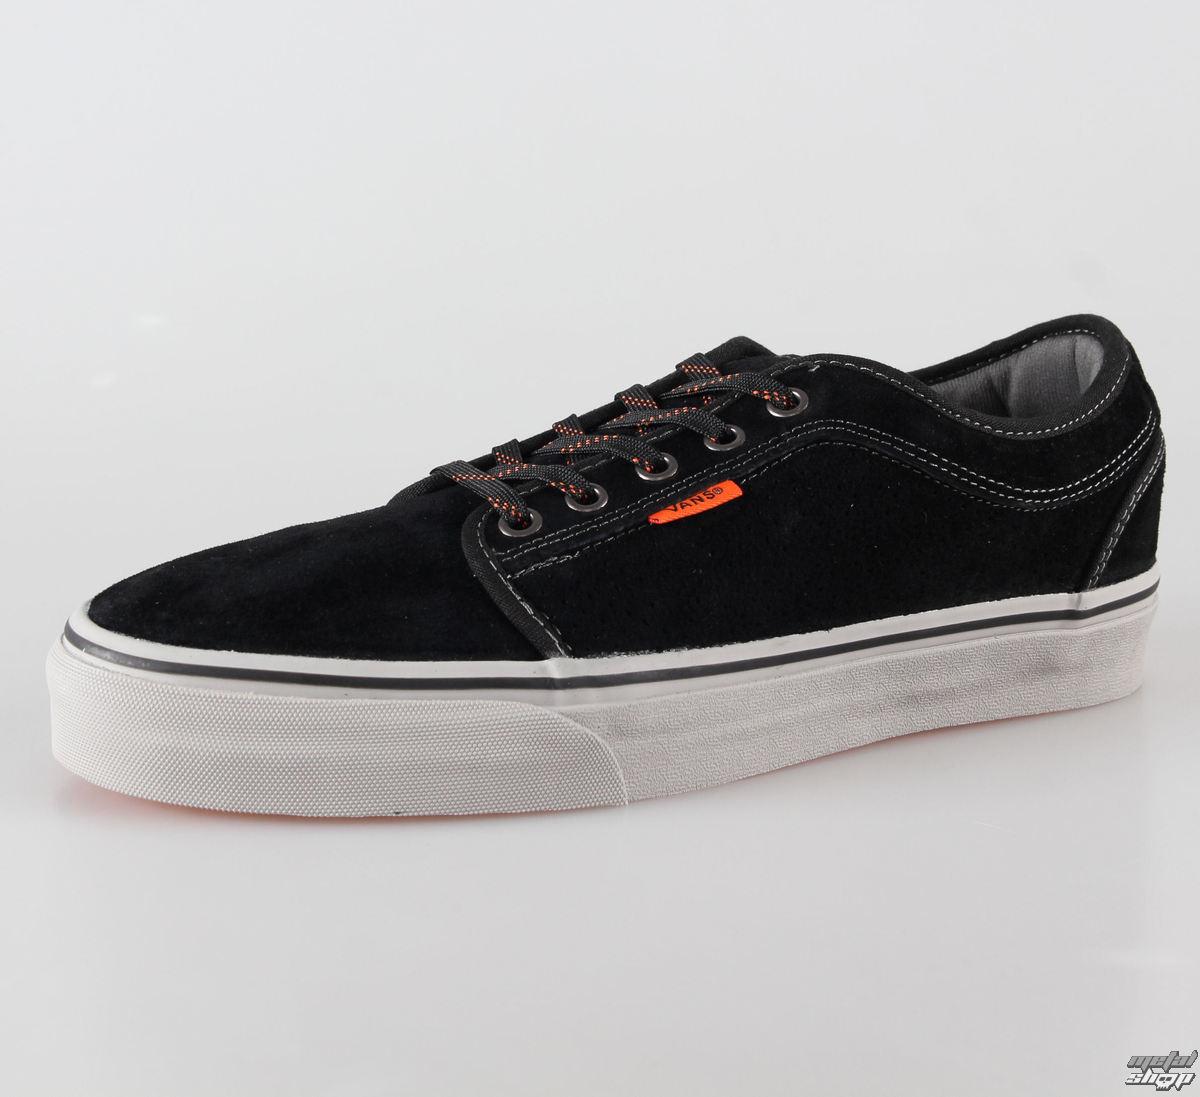 boty pánské VANS - Chukka Low - Black/Grey/Orange - VNKA0ZN